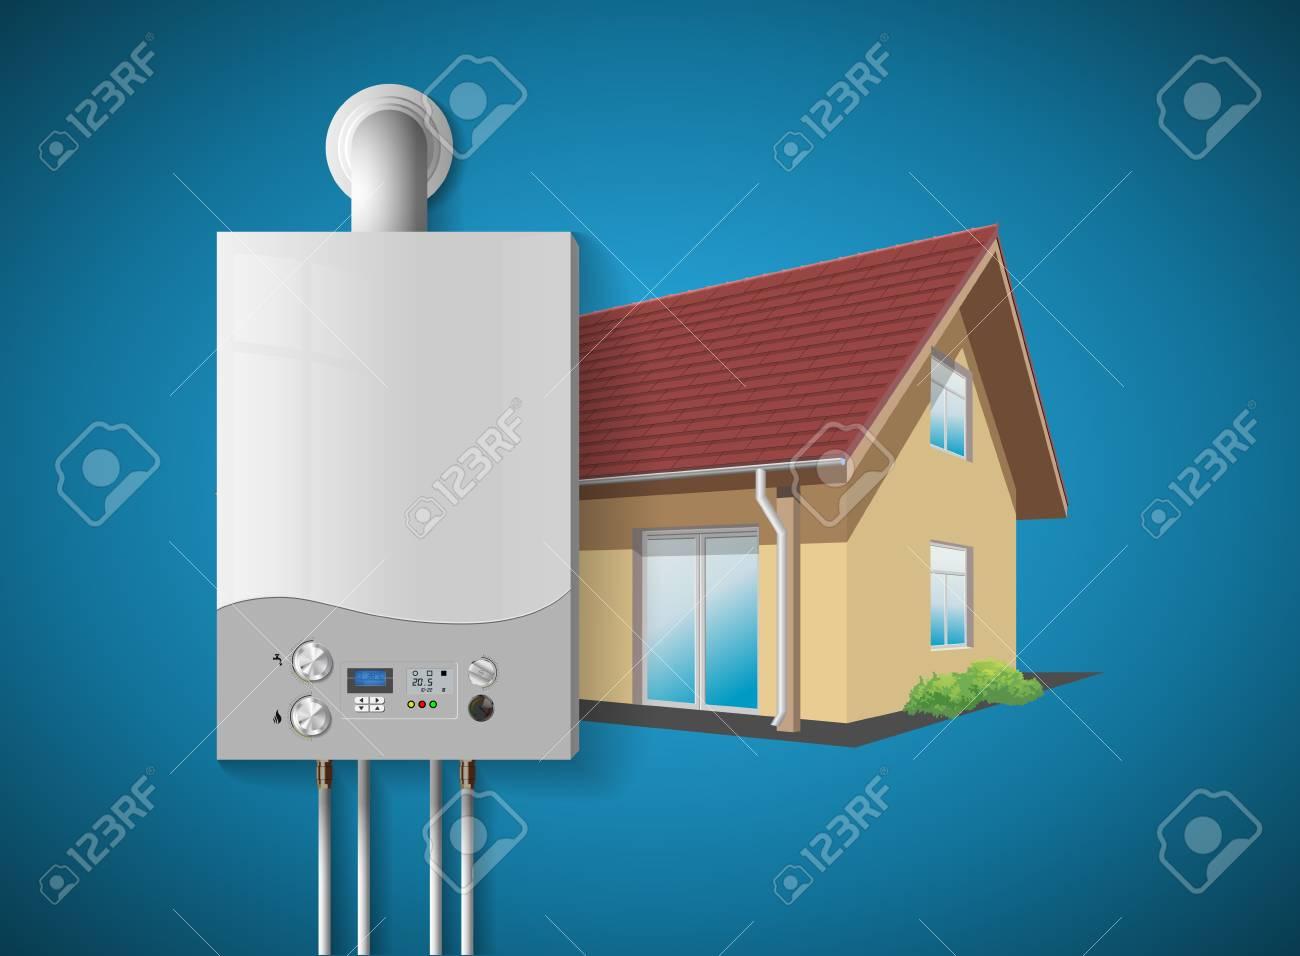 House Heating Concept - Modern Home Gas Fired Boiler - Energy ...